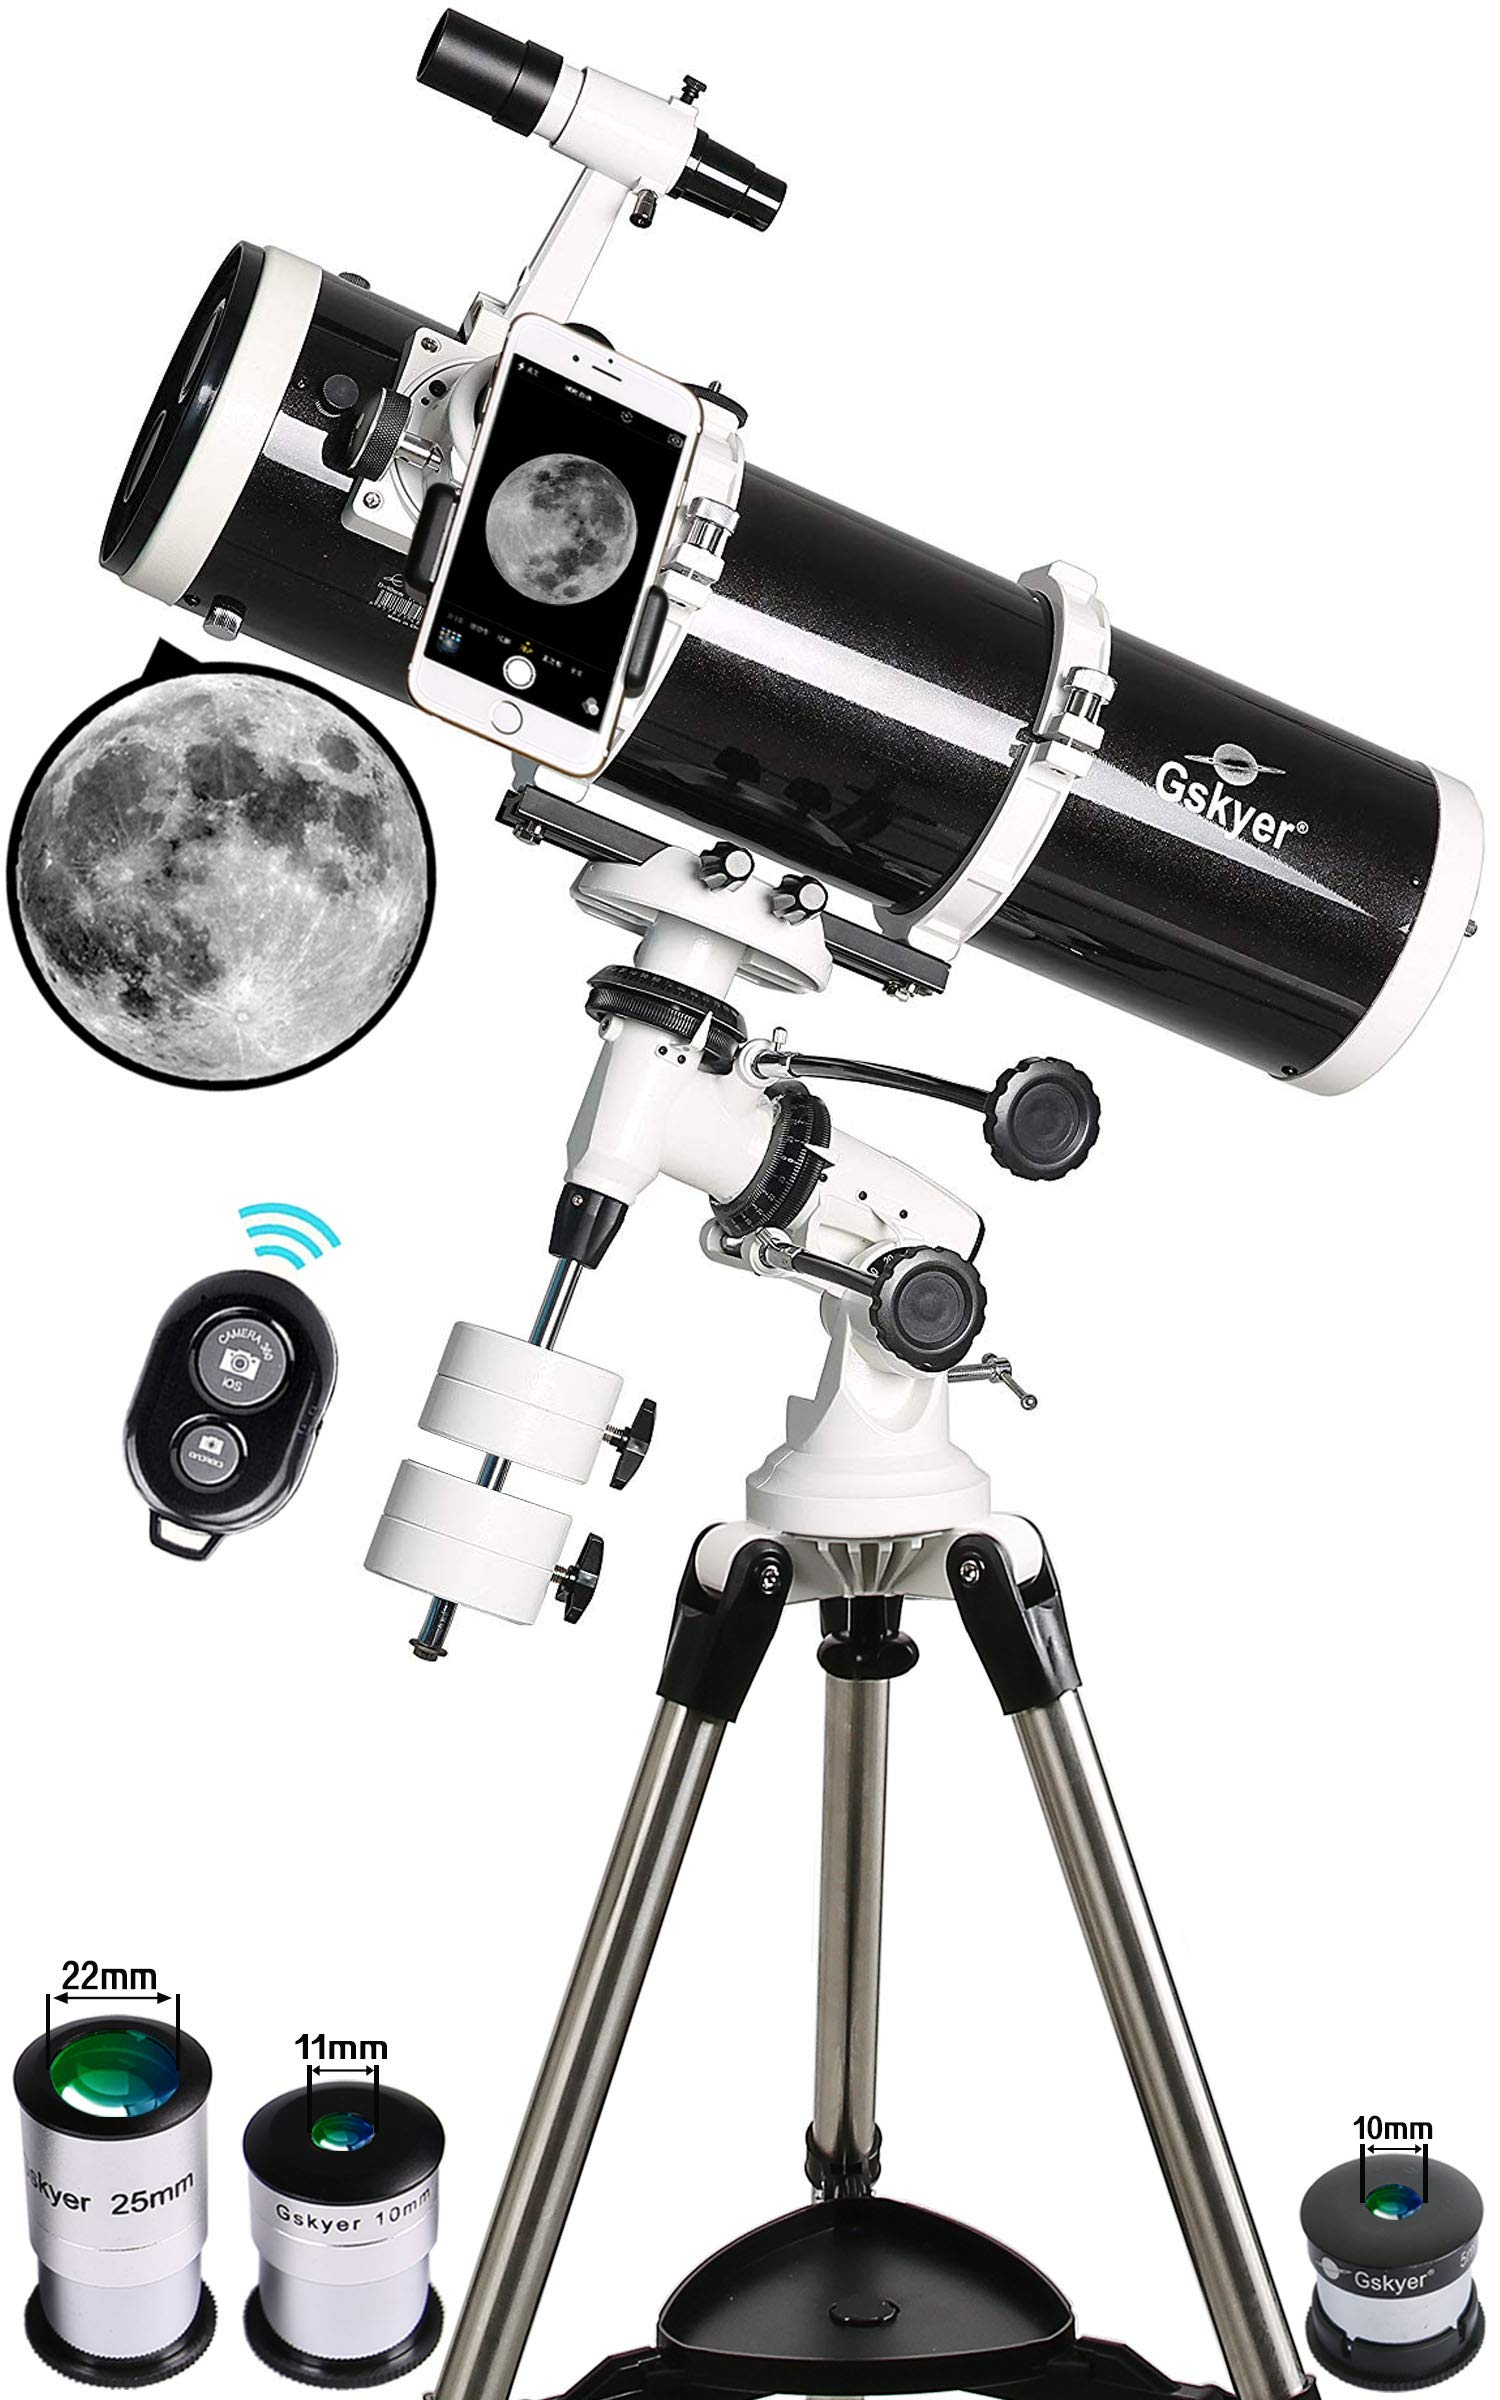 Gskyer Telescope, 130EQ Professional Astronomical Reflector Telescope, German Technology Scope by Gskyer